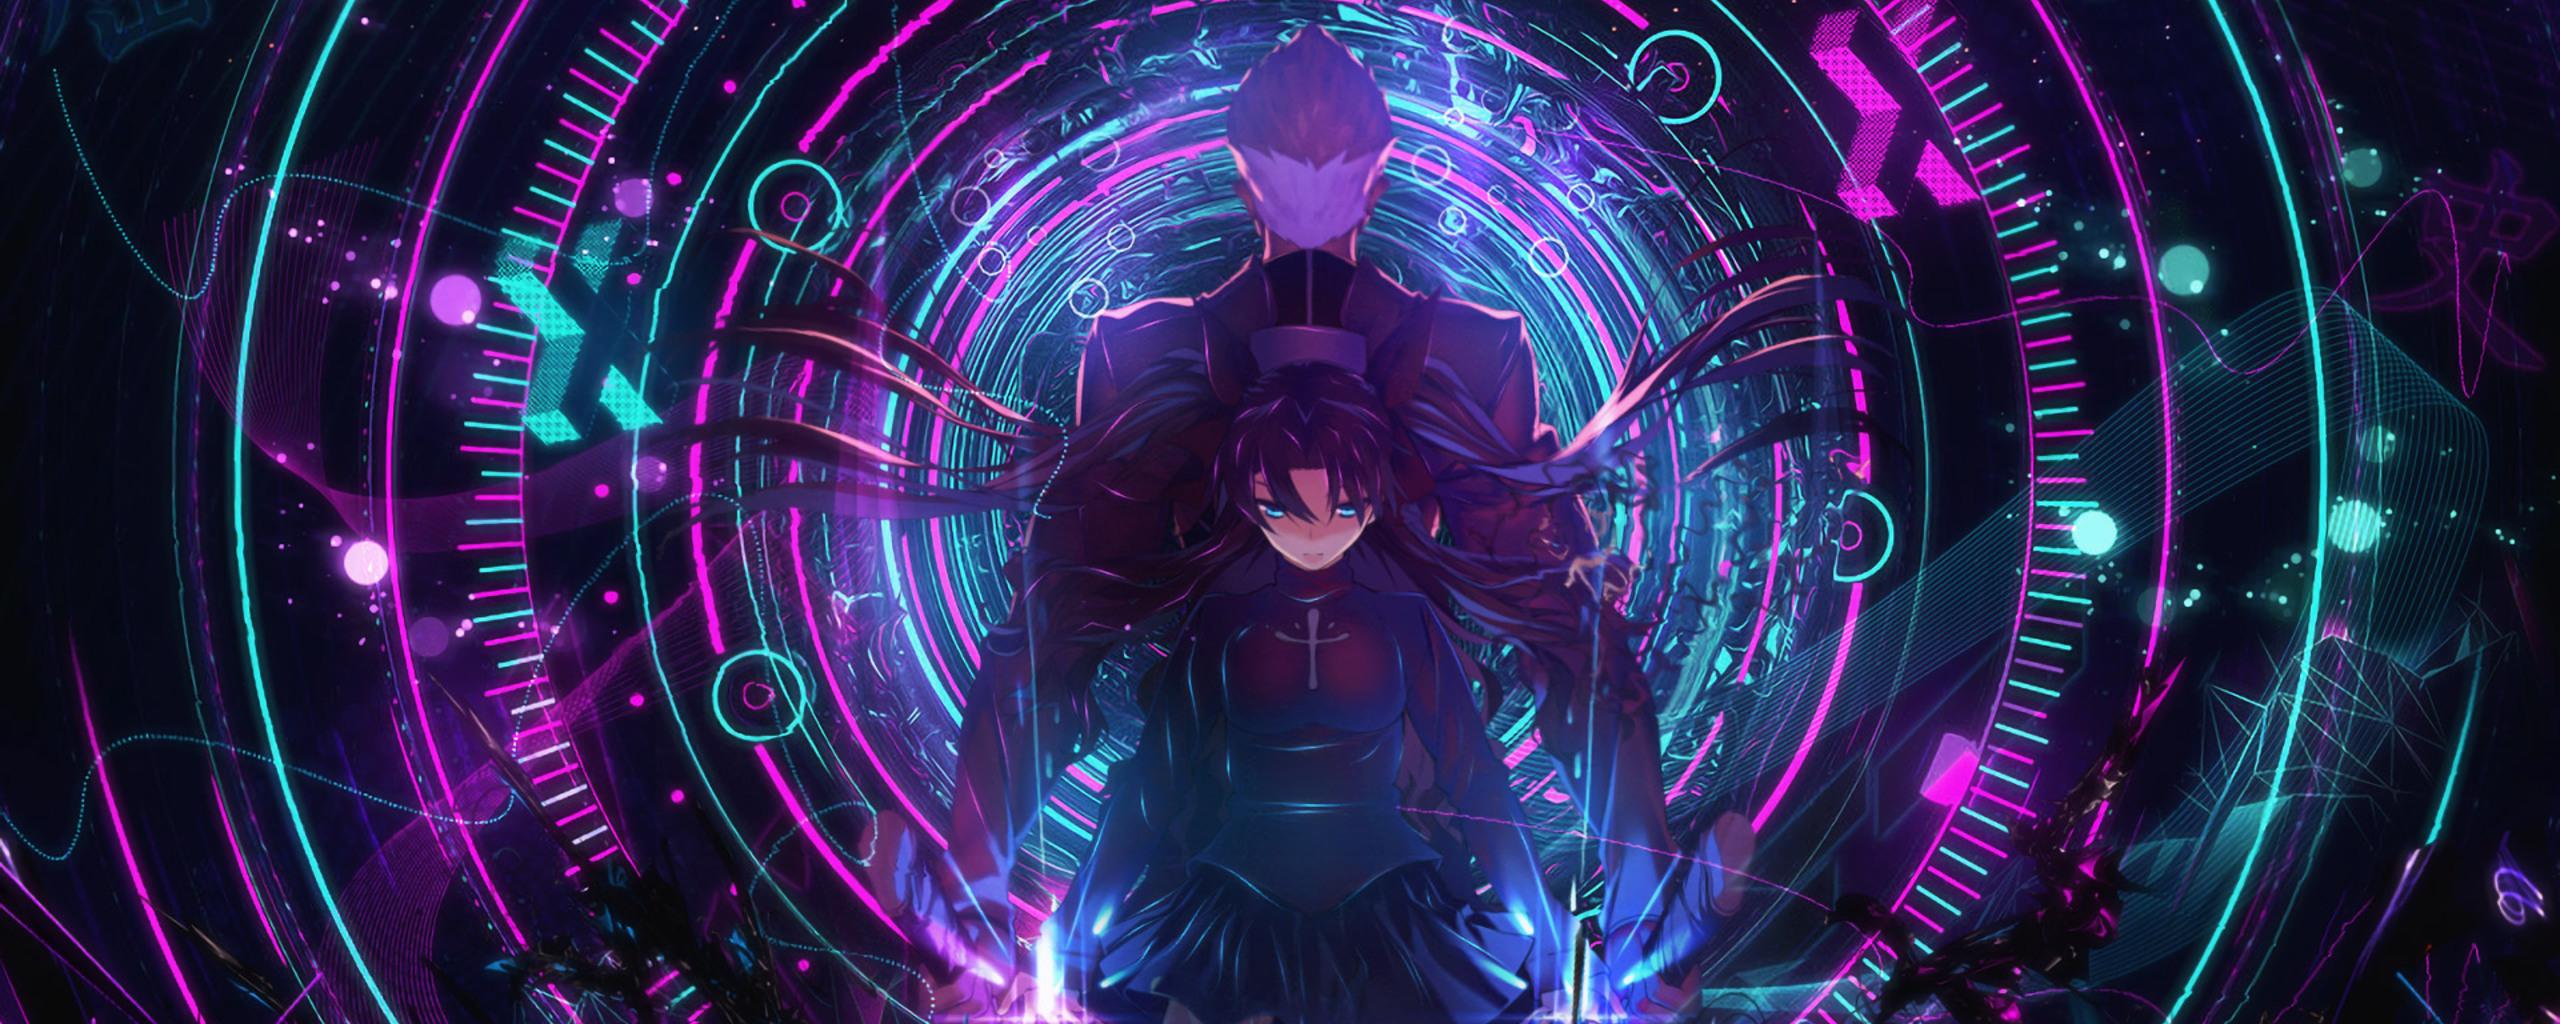 2560x1024 Archer Fate Stay Night Rin Tohsaka 2560x1024 Resolution